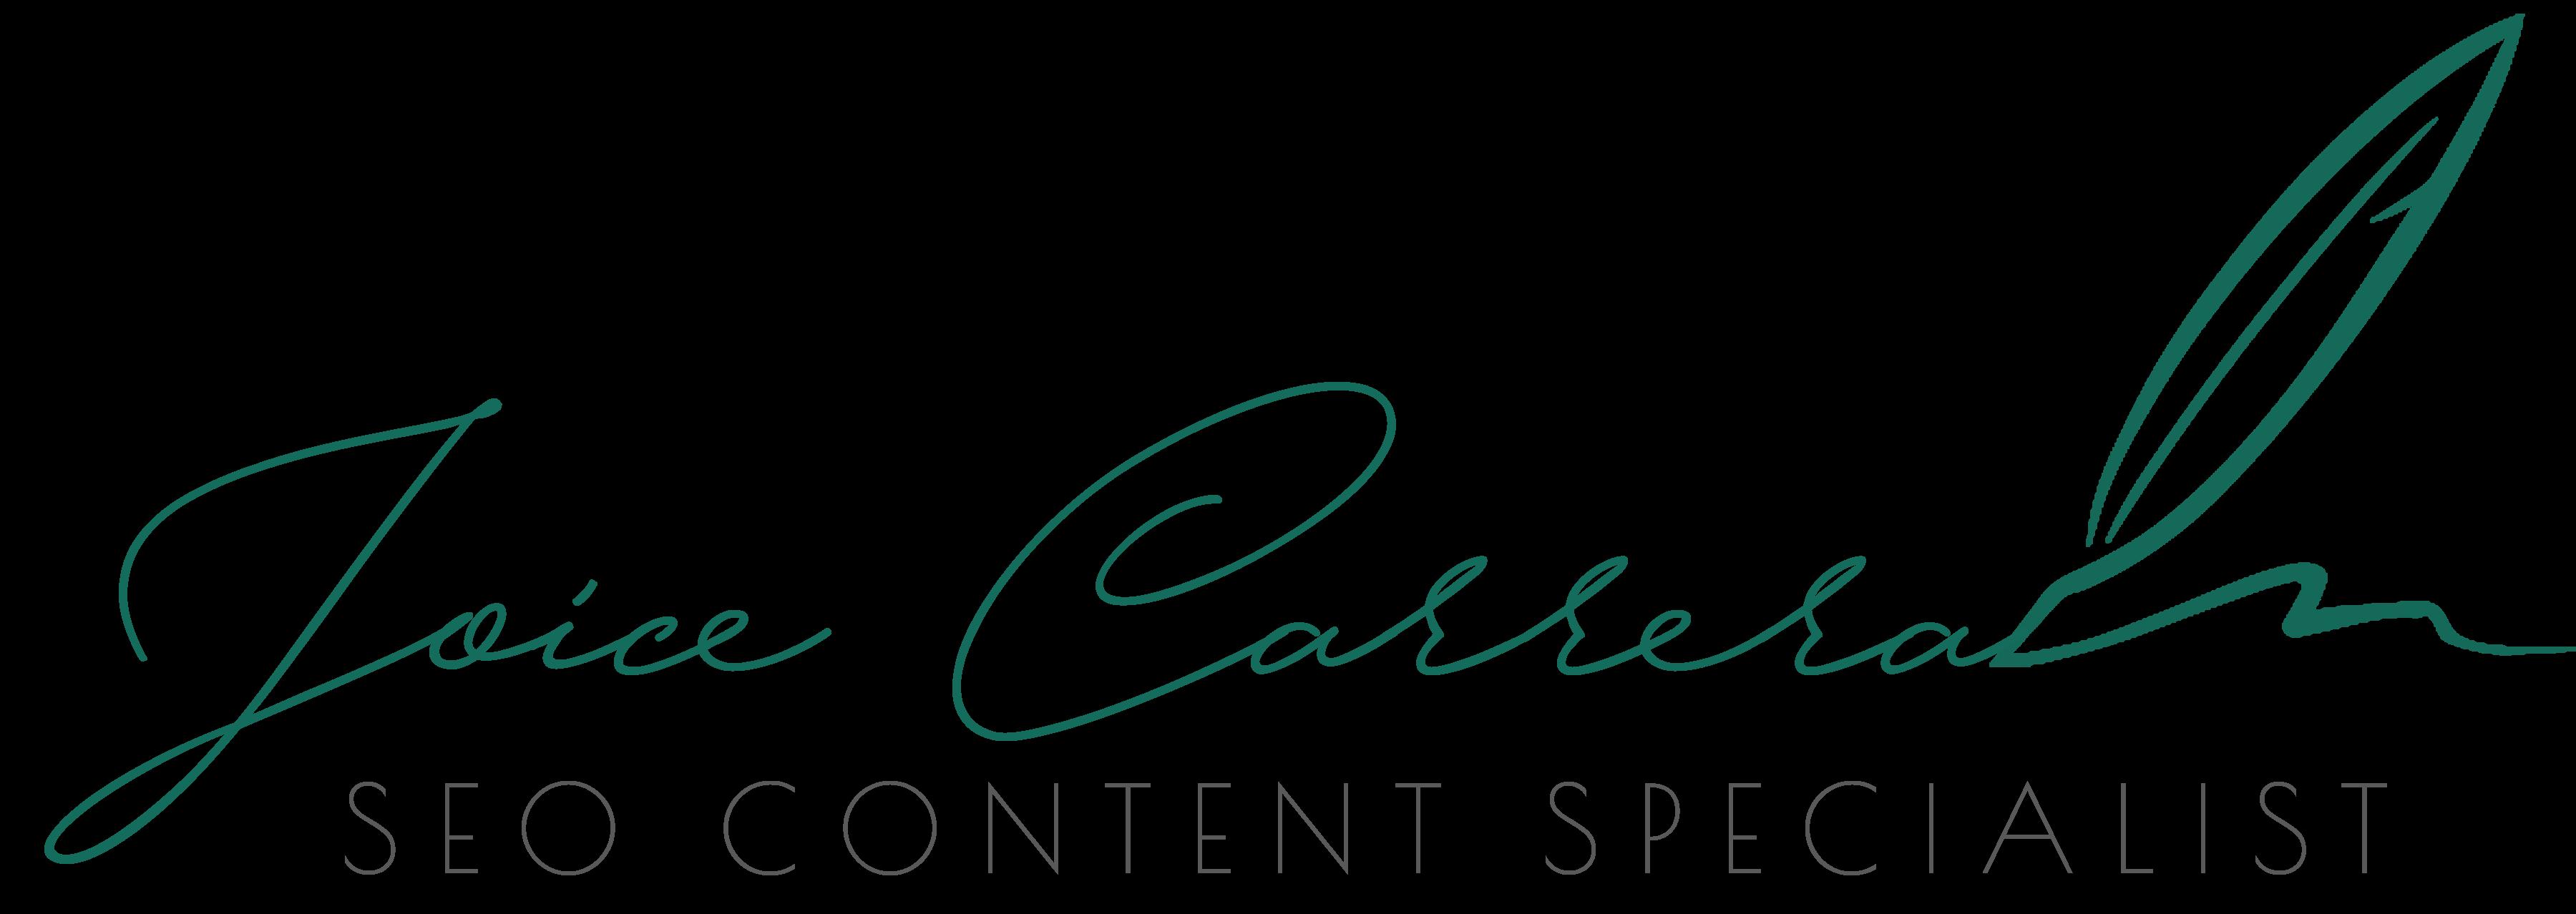 Joice Carrera | SEO Content Specialist